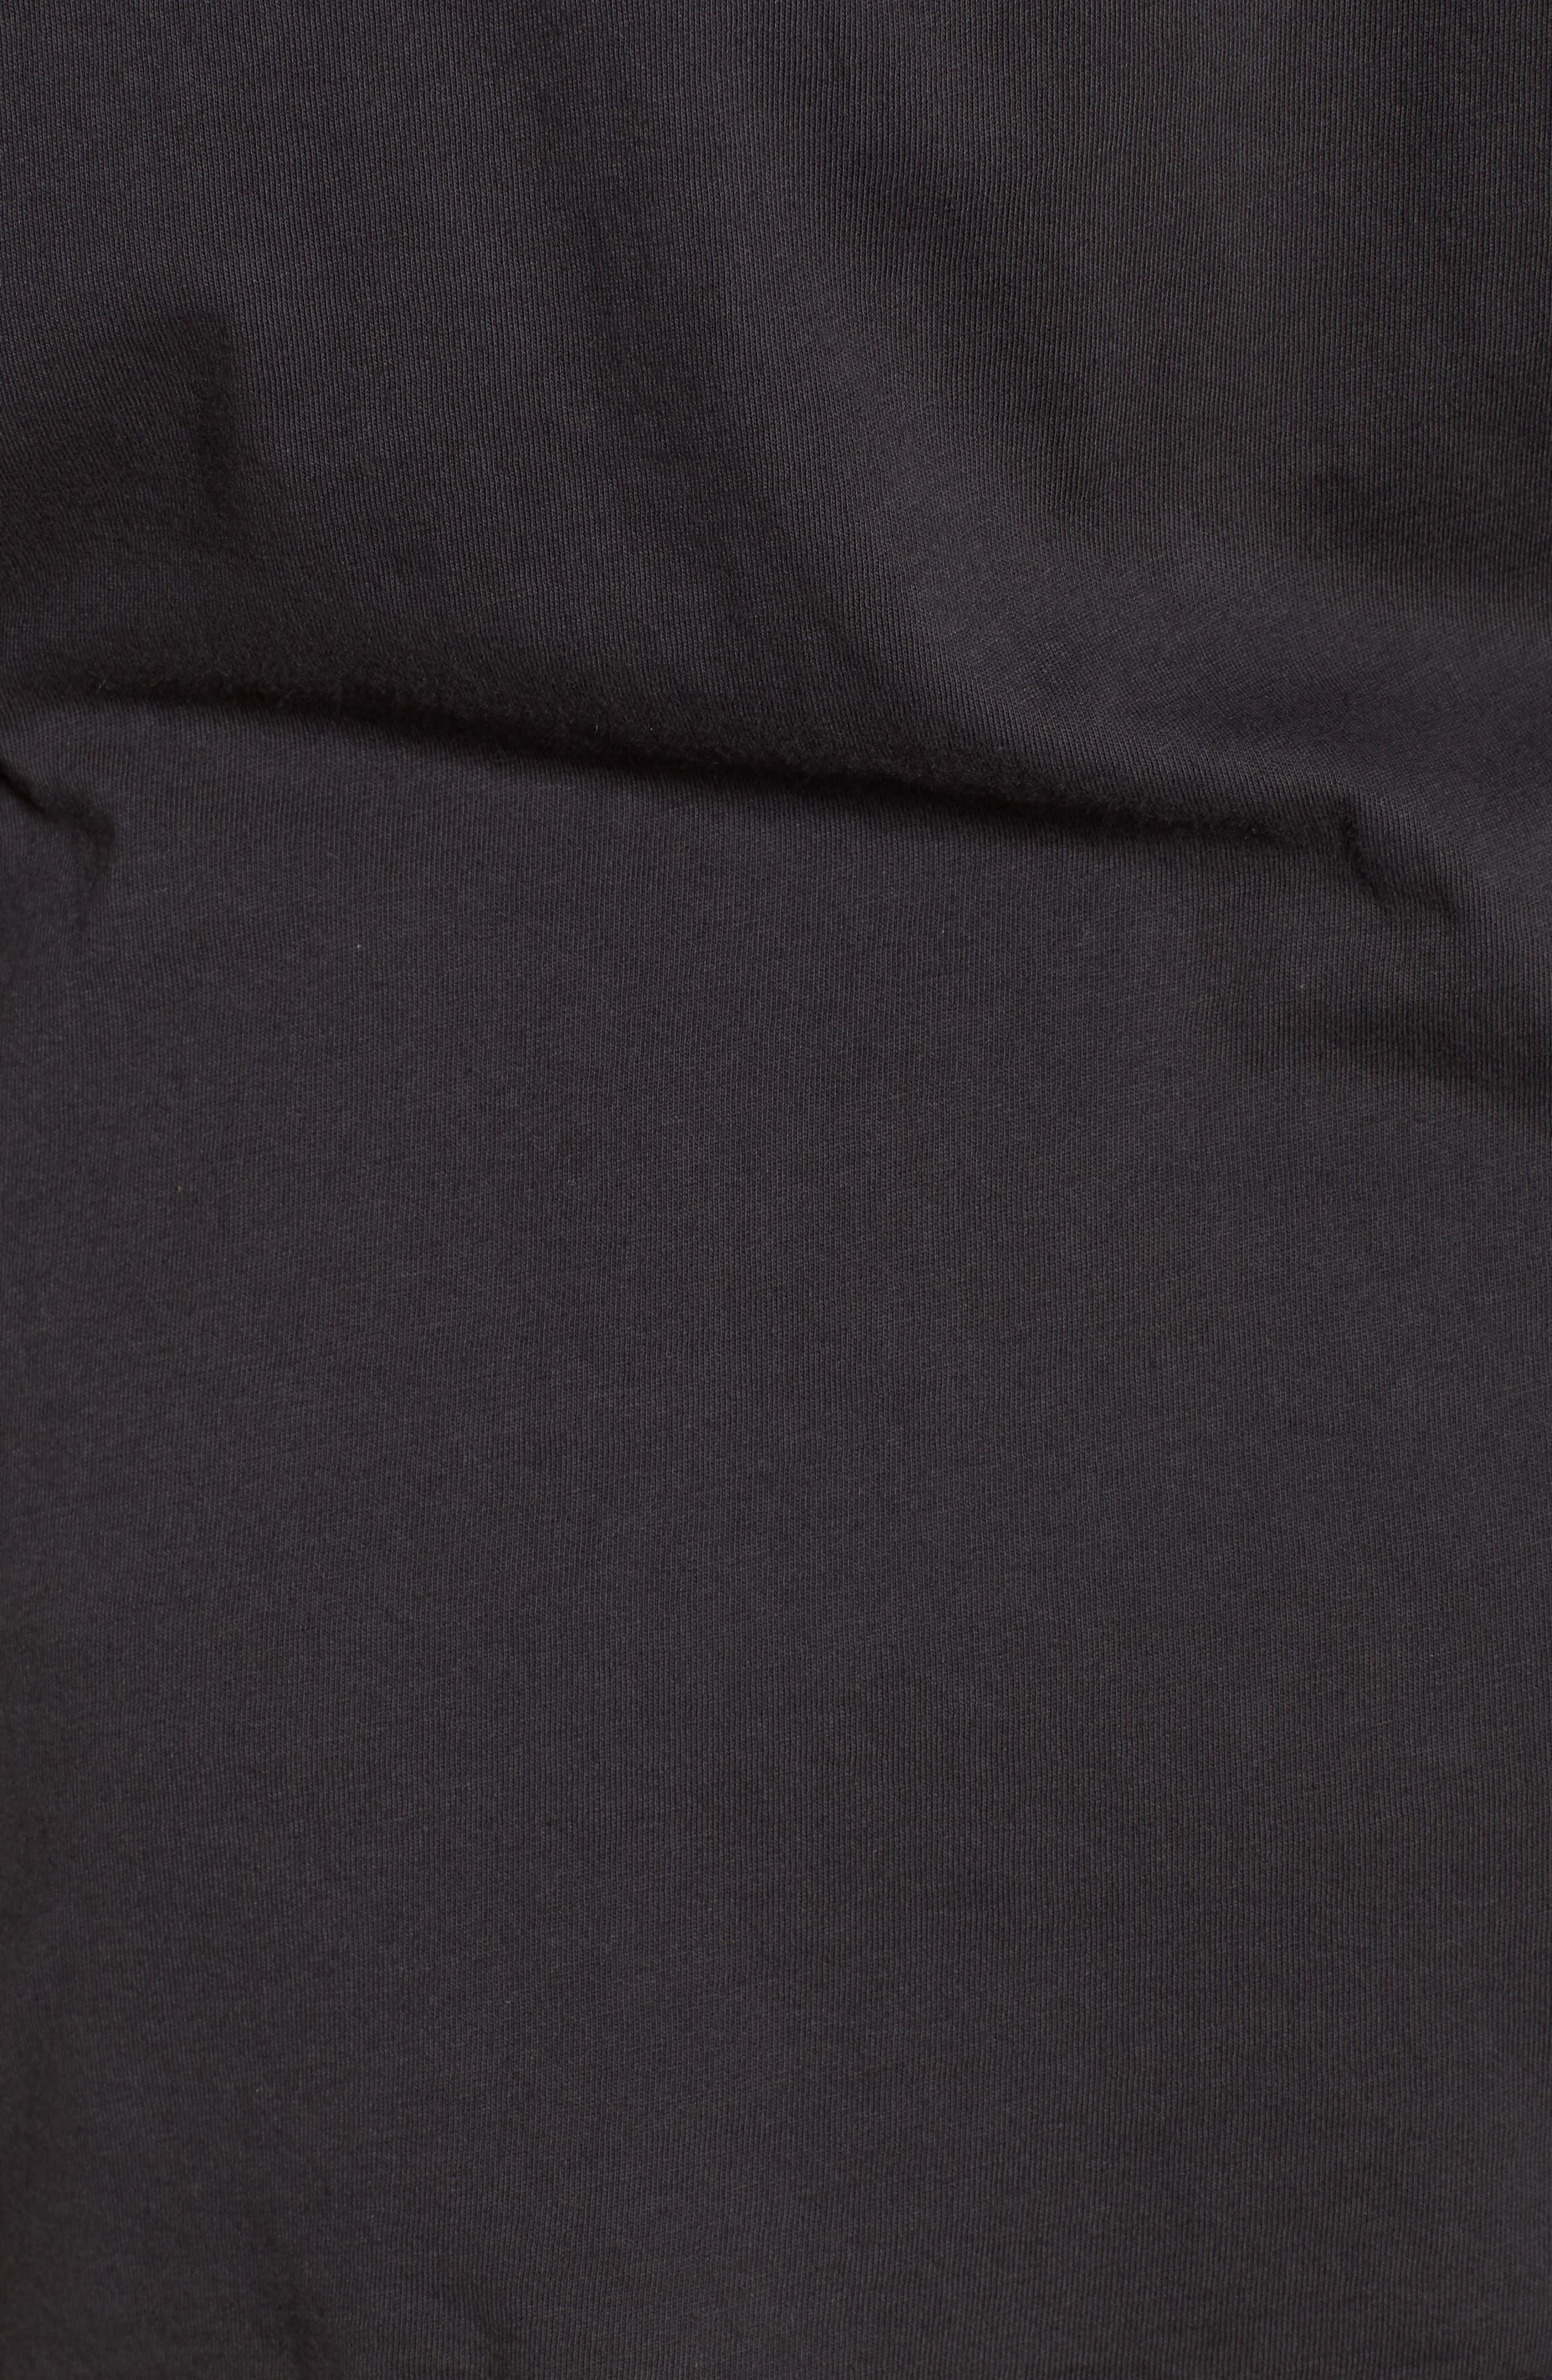 Vintage Wettie Heritage T-Shirt,                             Alternate thumbnail 5, color,                             Charcoal